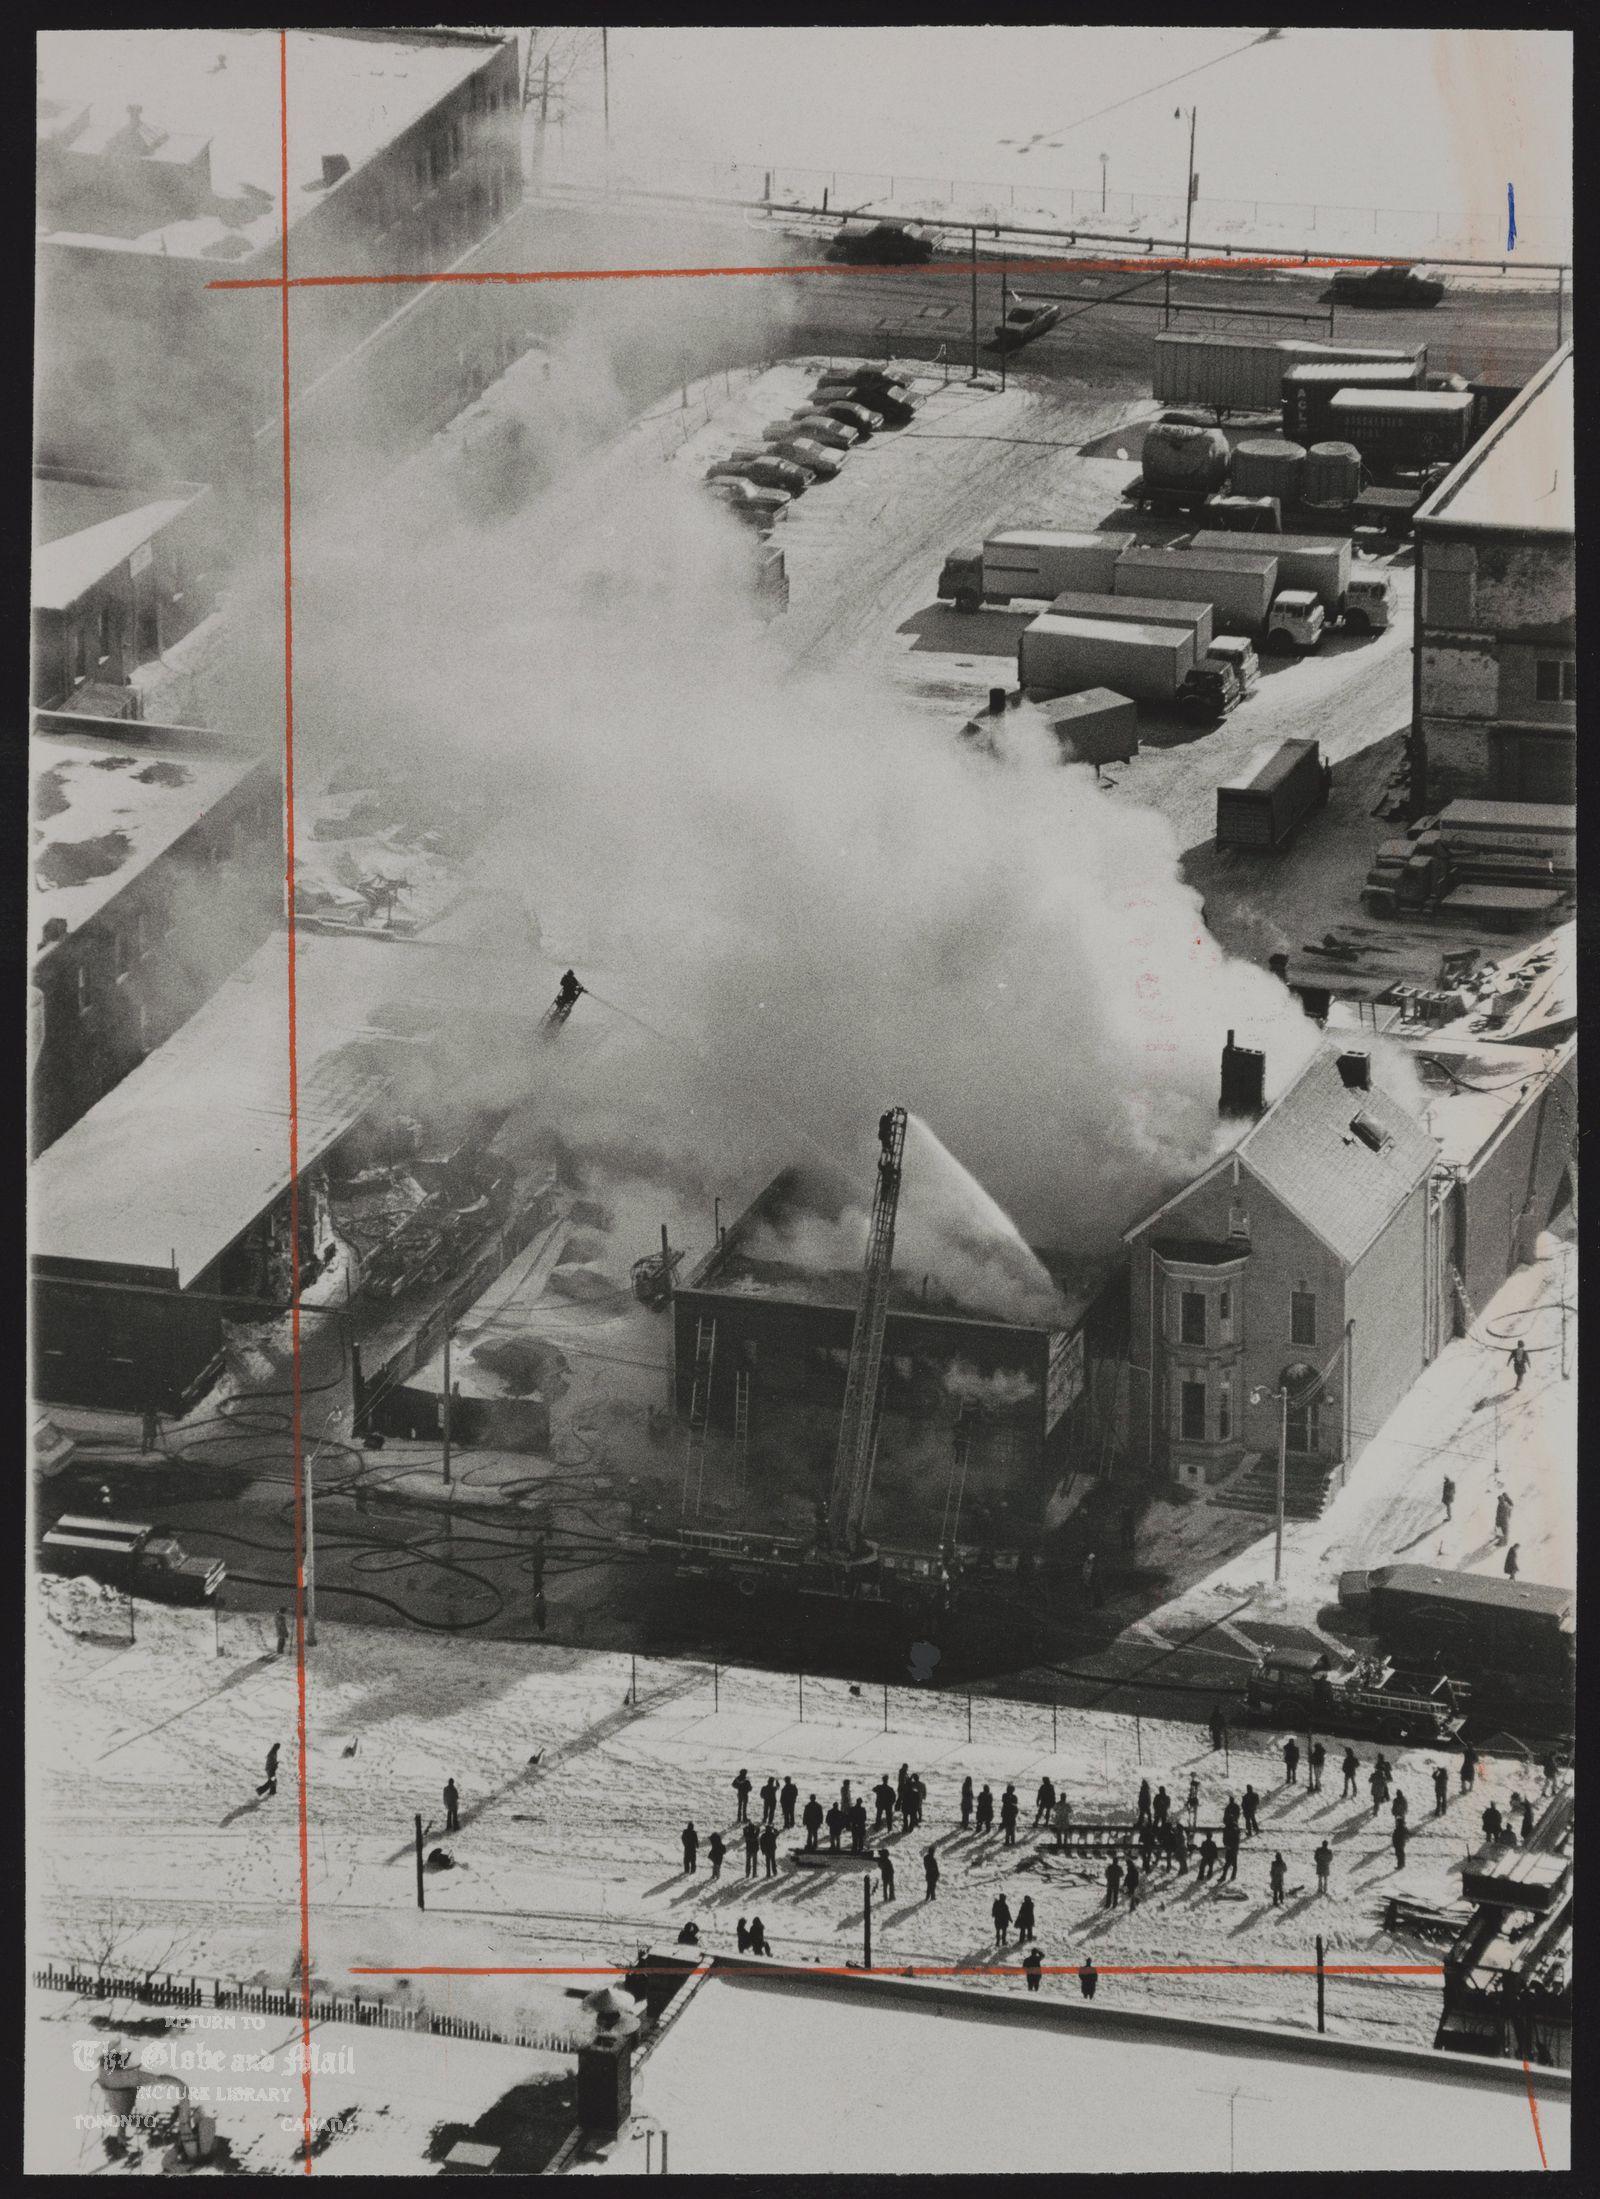 TORONTO ARTS PRODUCTION Firemen pour water on the Toronto Arts Productions Building, which was gutted.